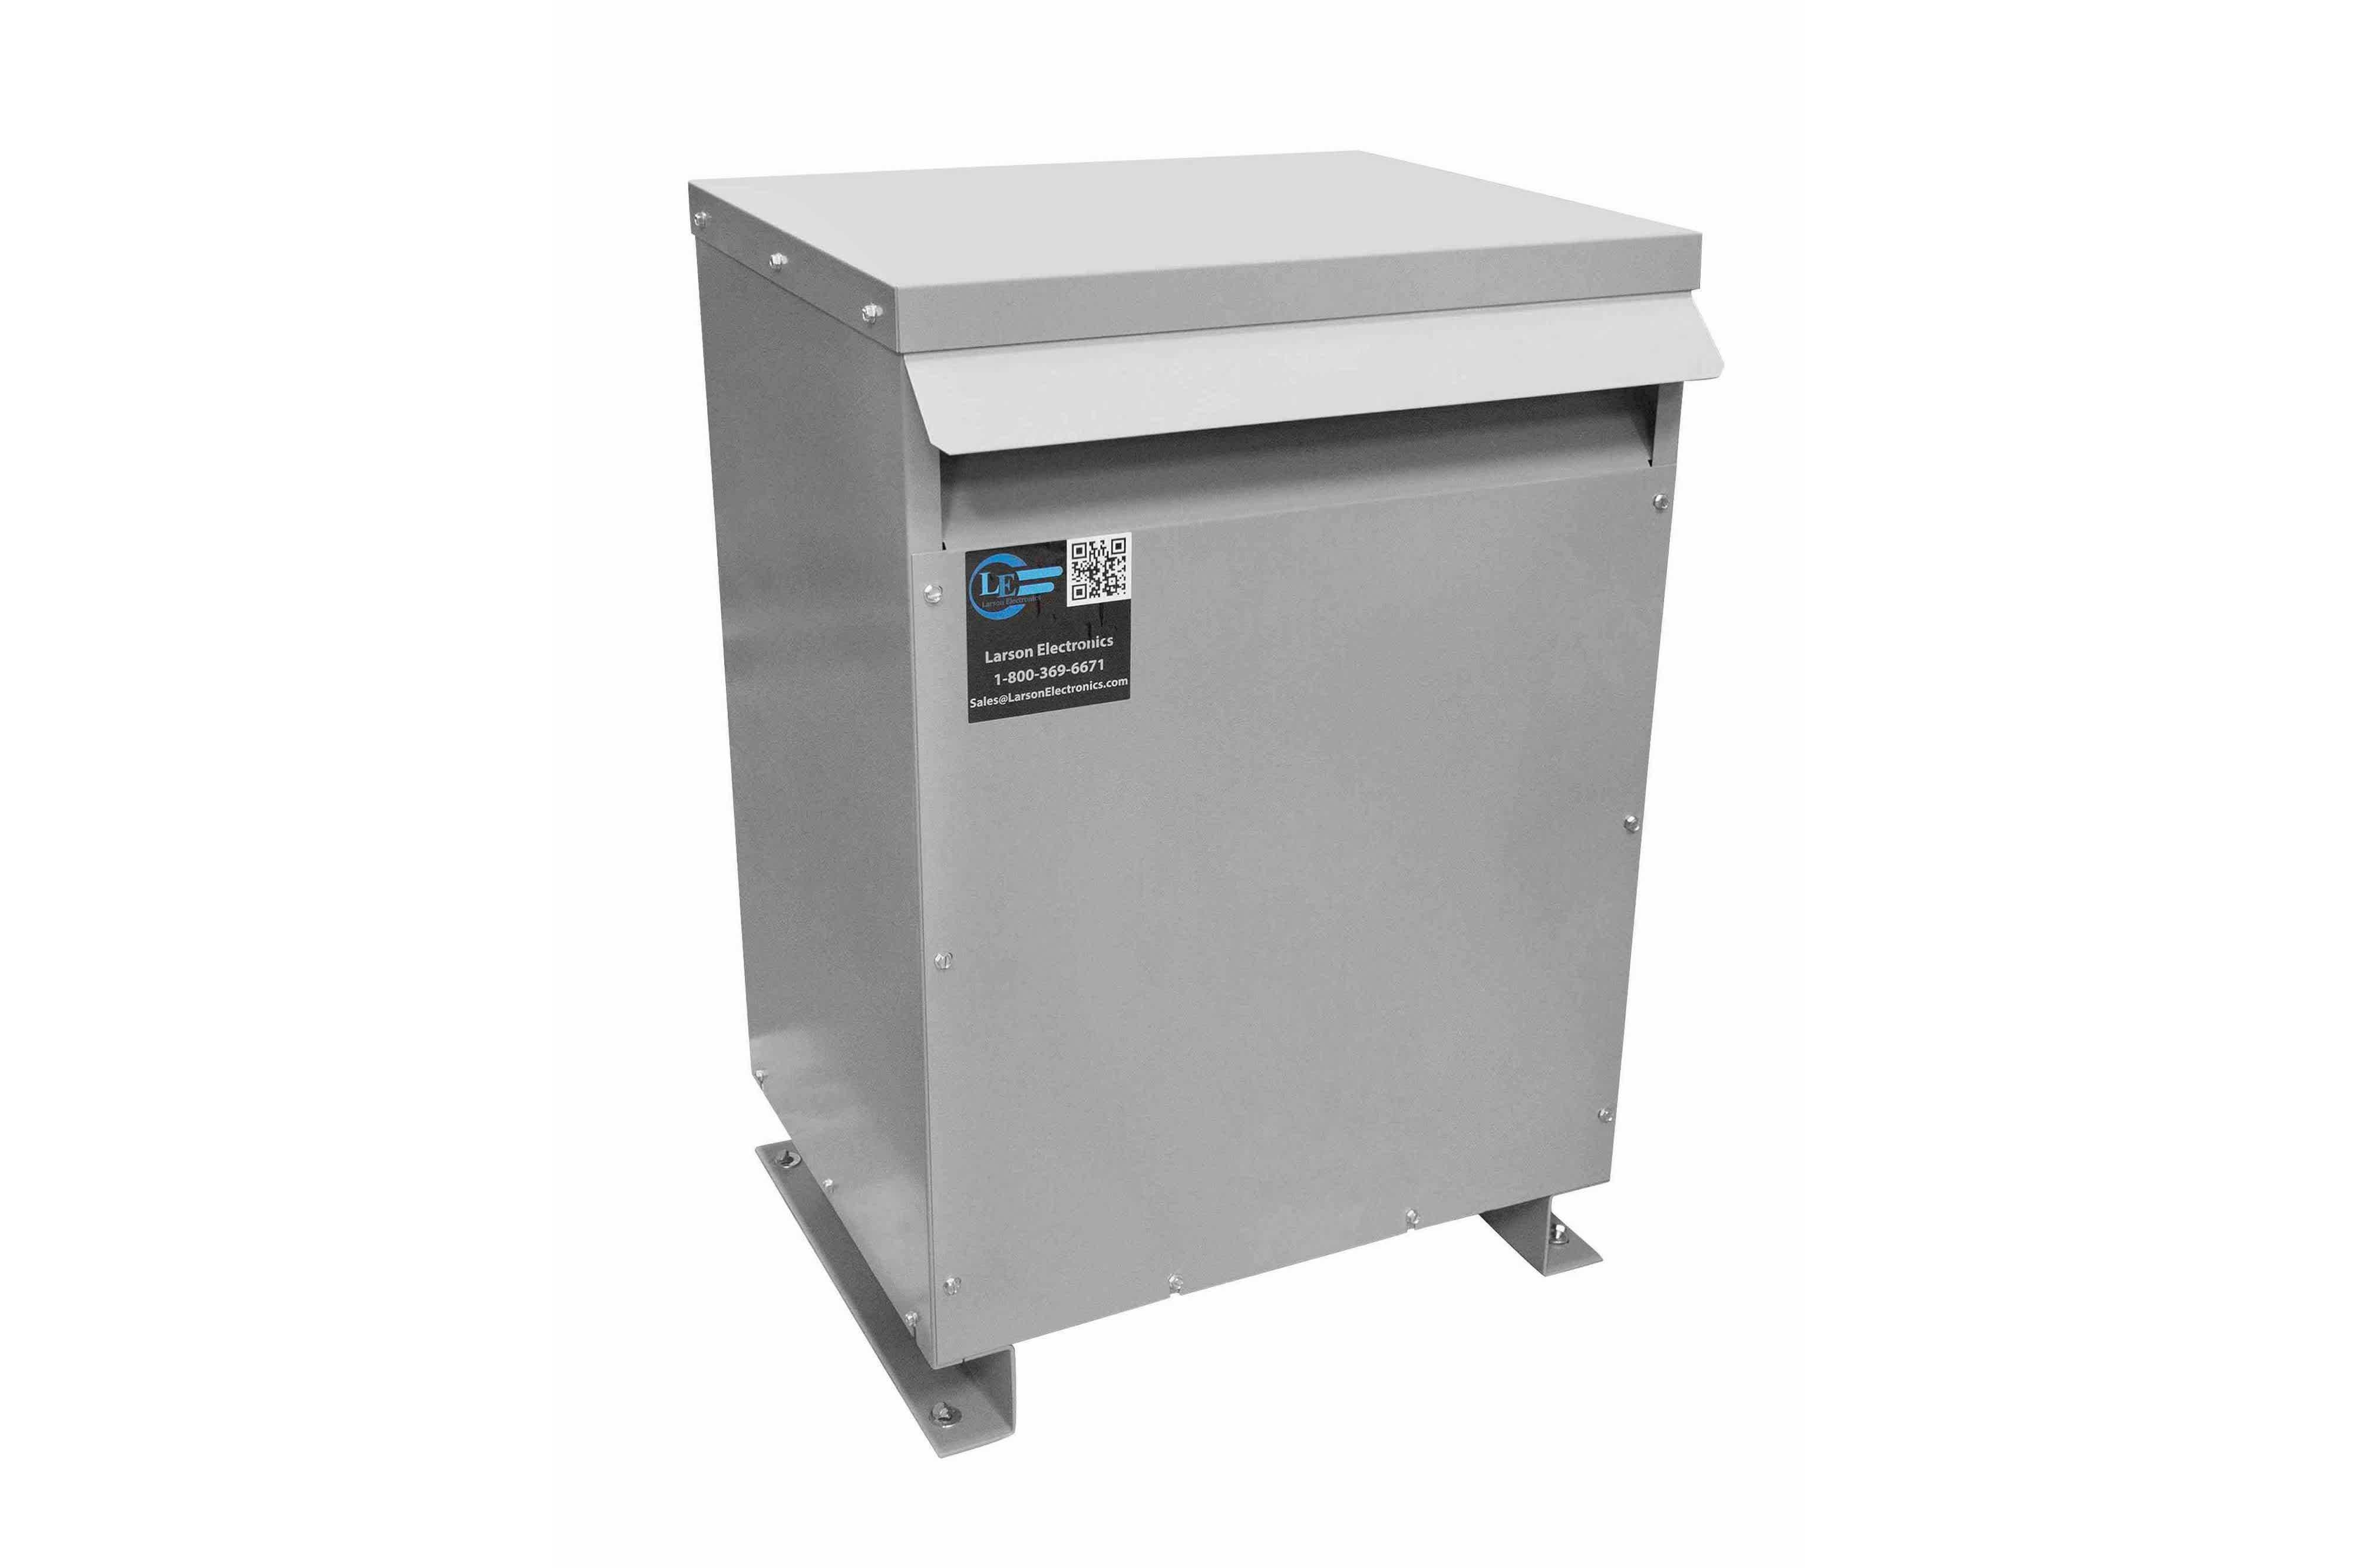 10 kVA 3PH Isolation Transformer, 208V Wye Primary, 400V Delta Secondary, N3R, Ventilated, 60 Hz